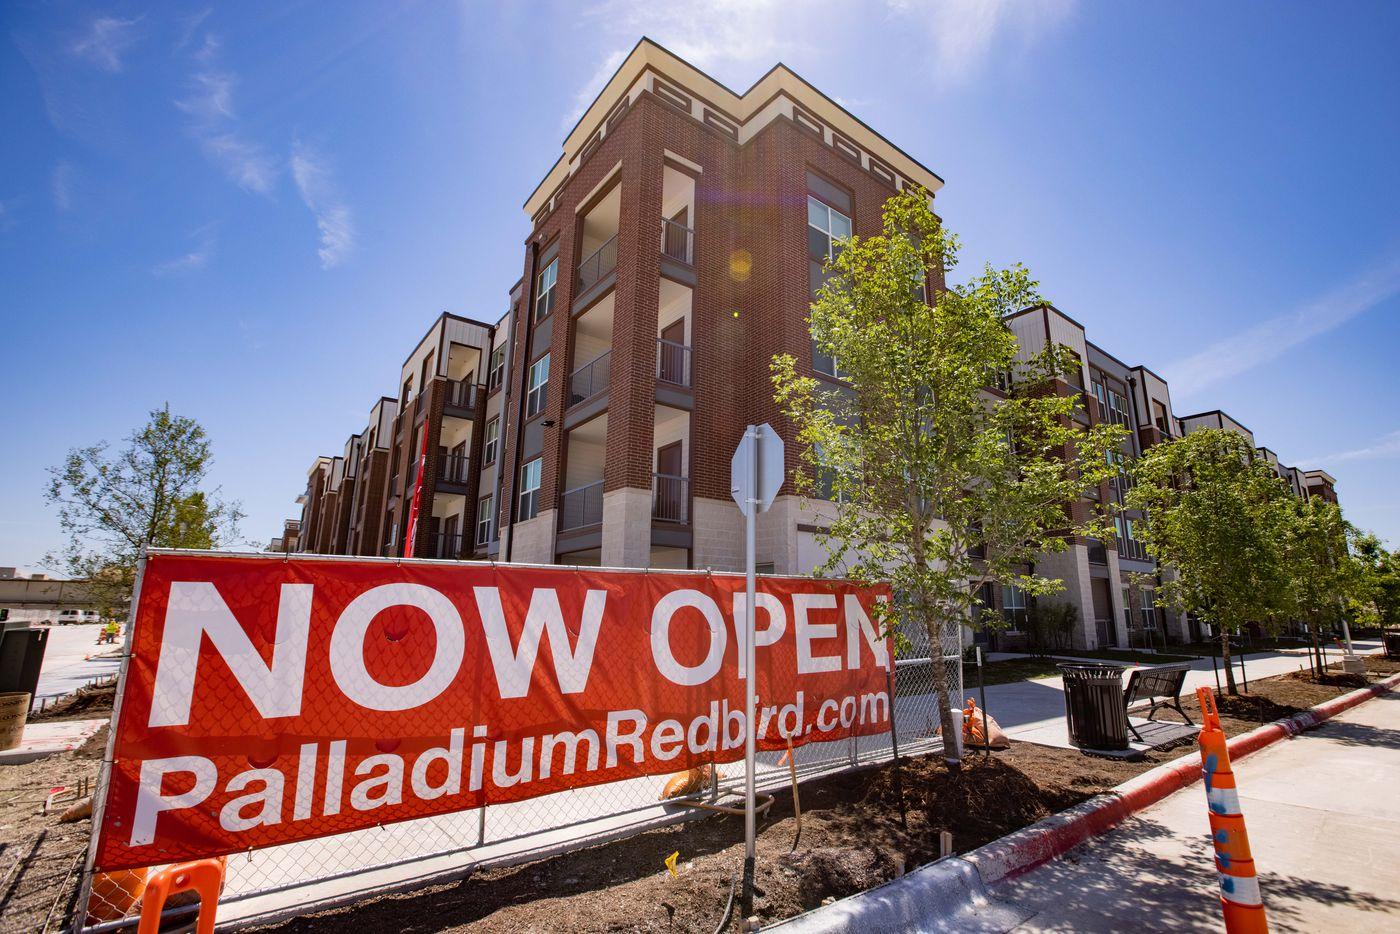 The exterior of the Palladium RedBird apartments.